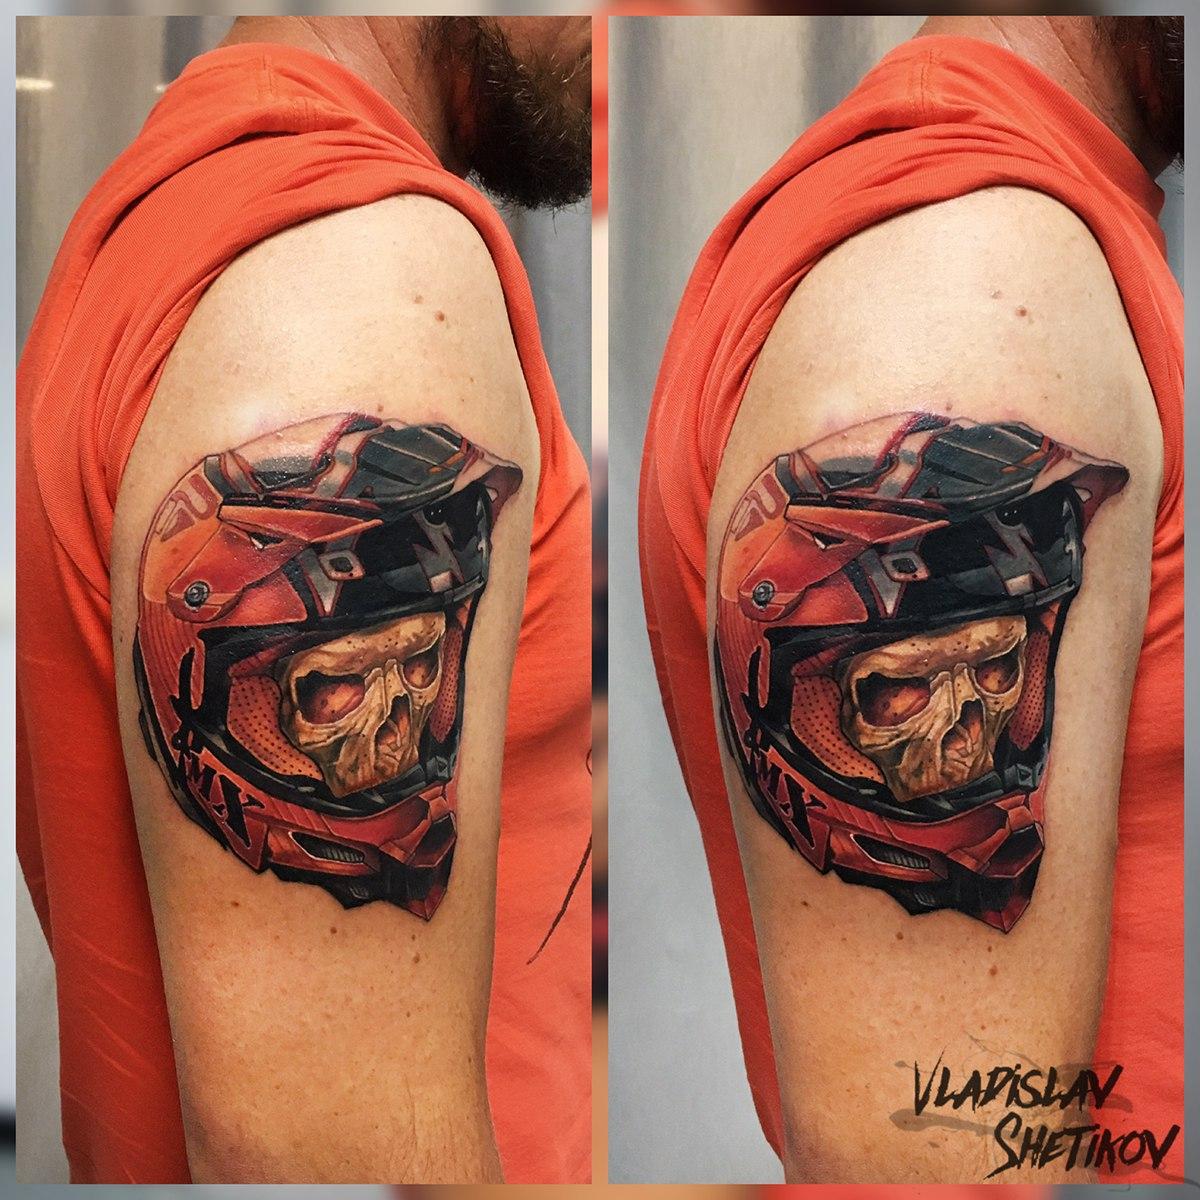 Skull in sports hamlet tattoo on sholder